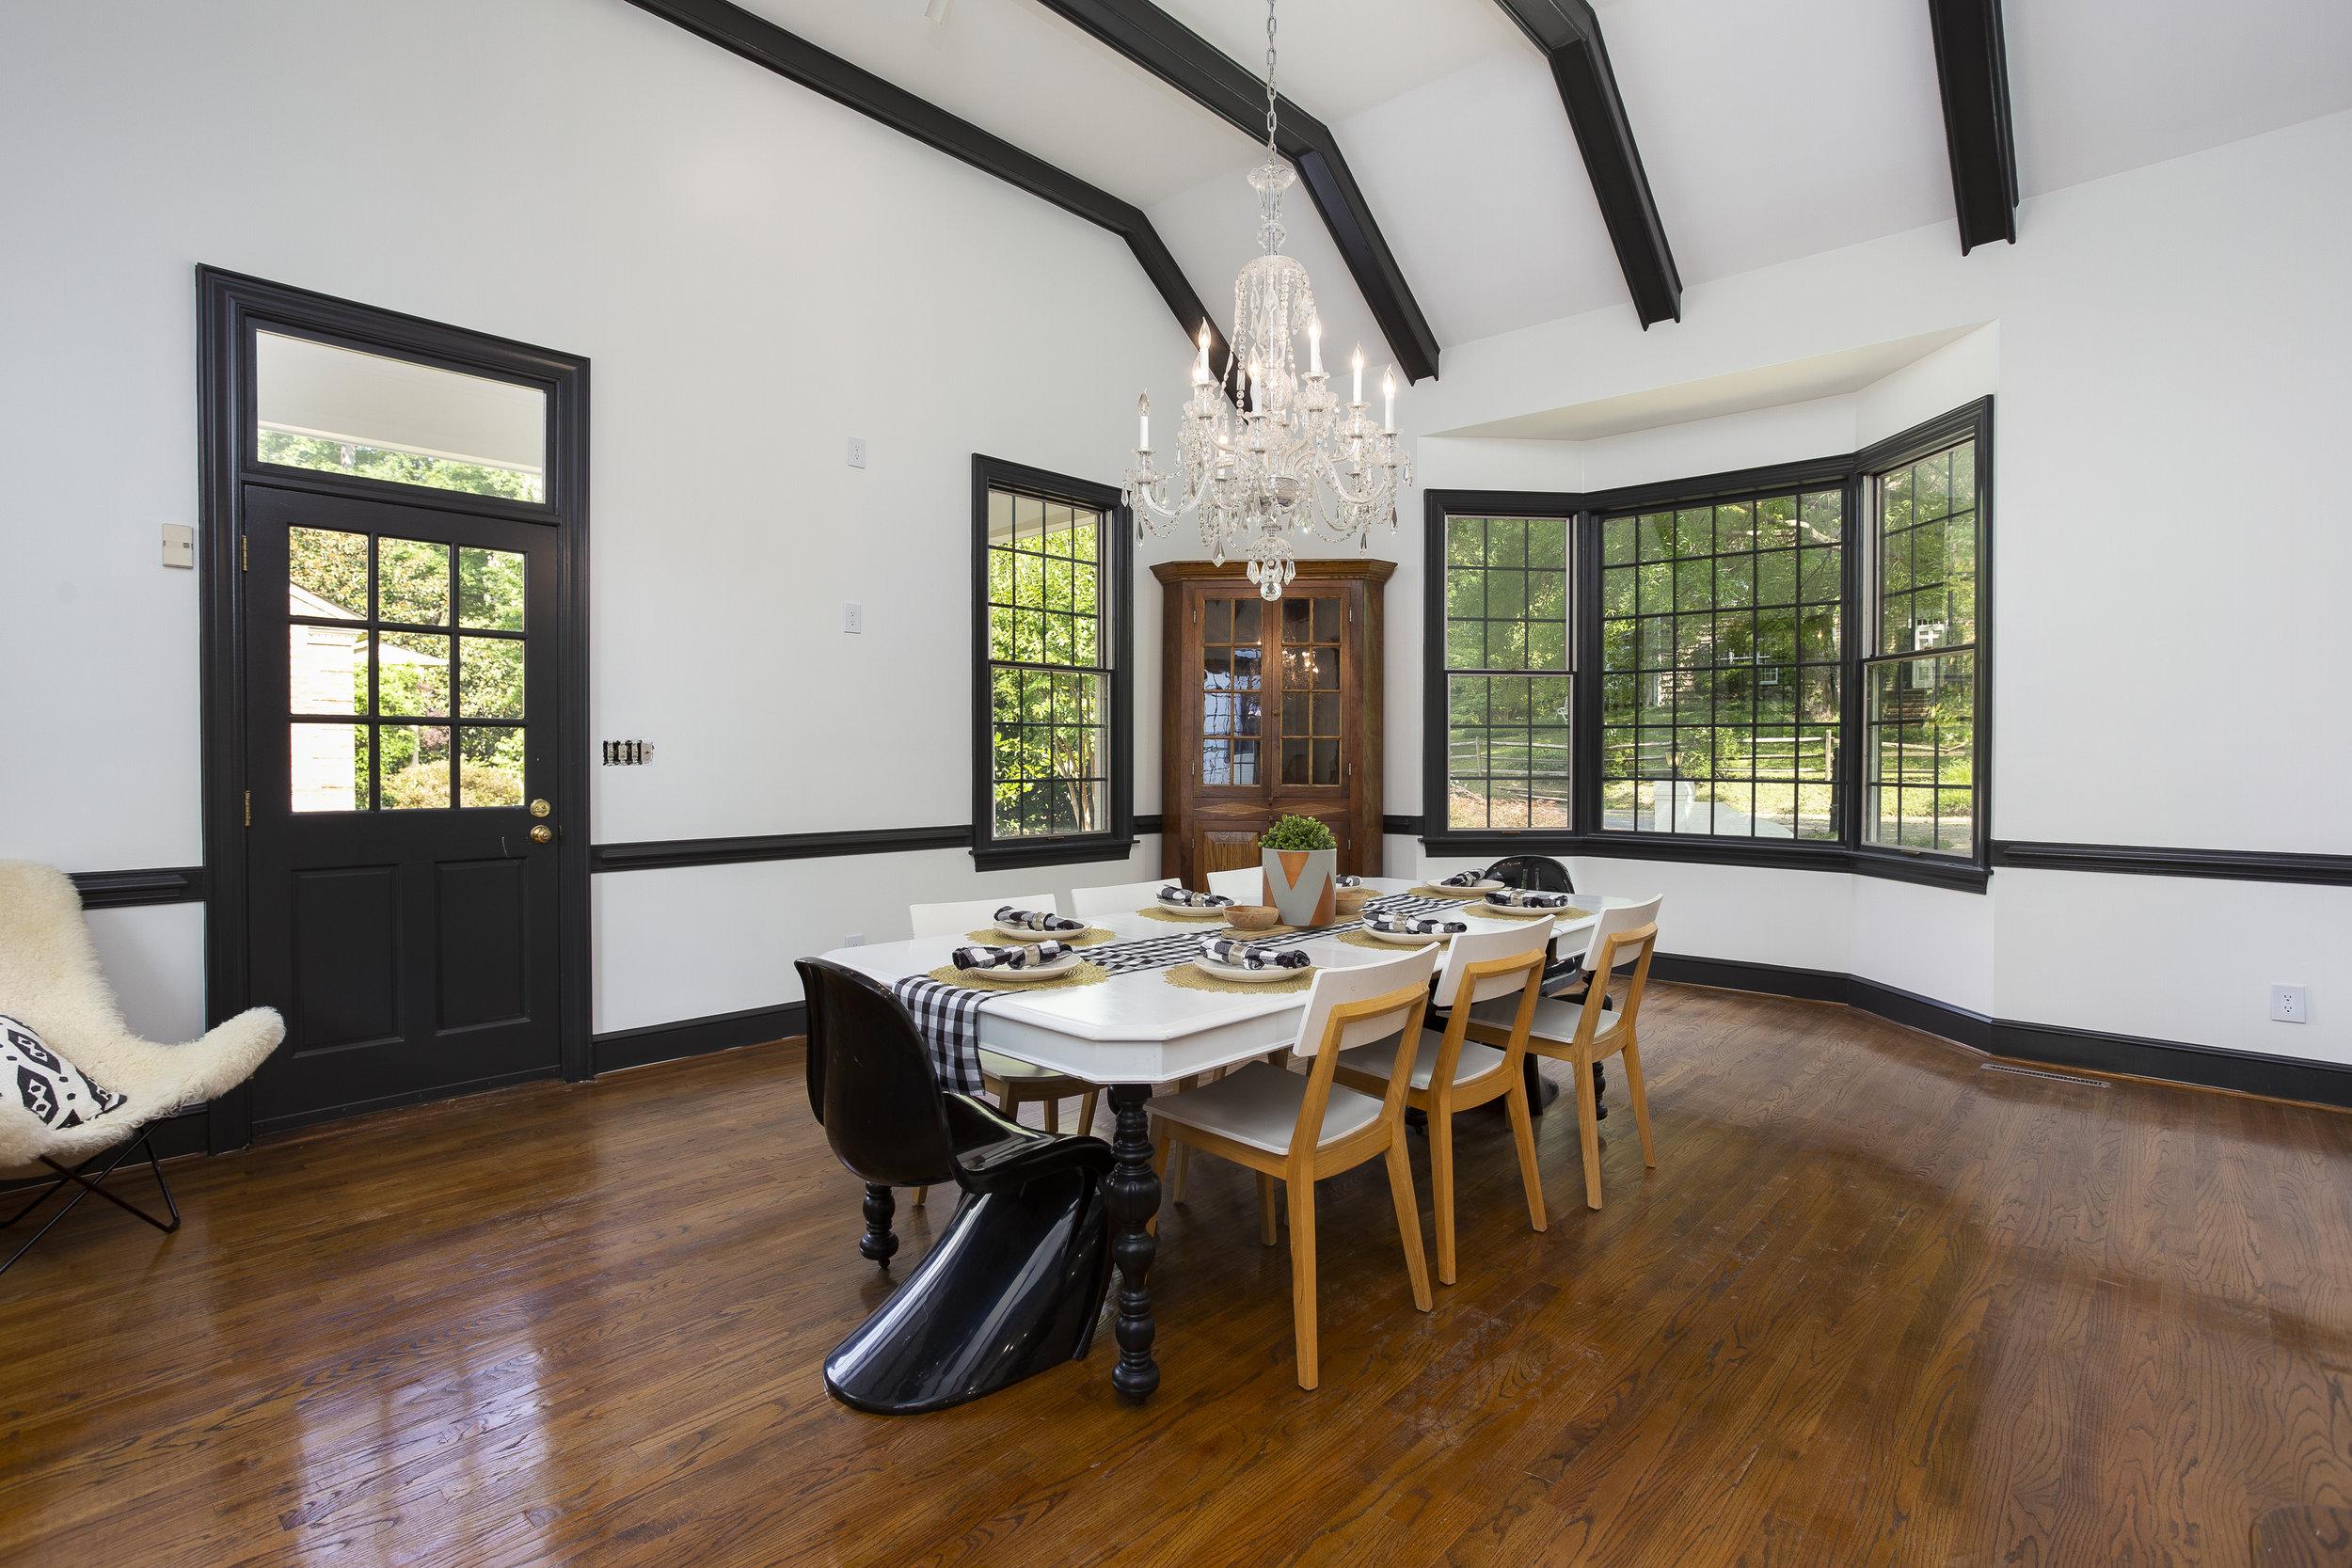 greesboro-real-estate-photographer-photography-commercial-realtor-house-high-point-kernersville-burlington109.jpg